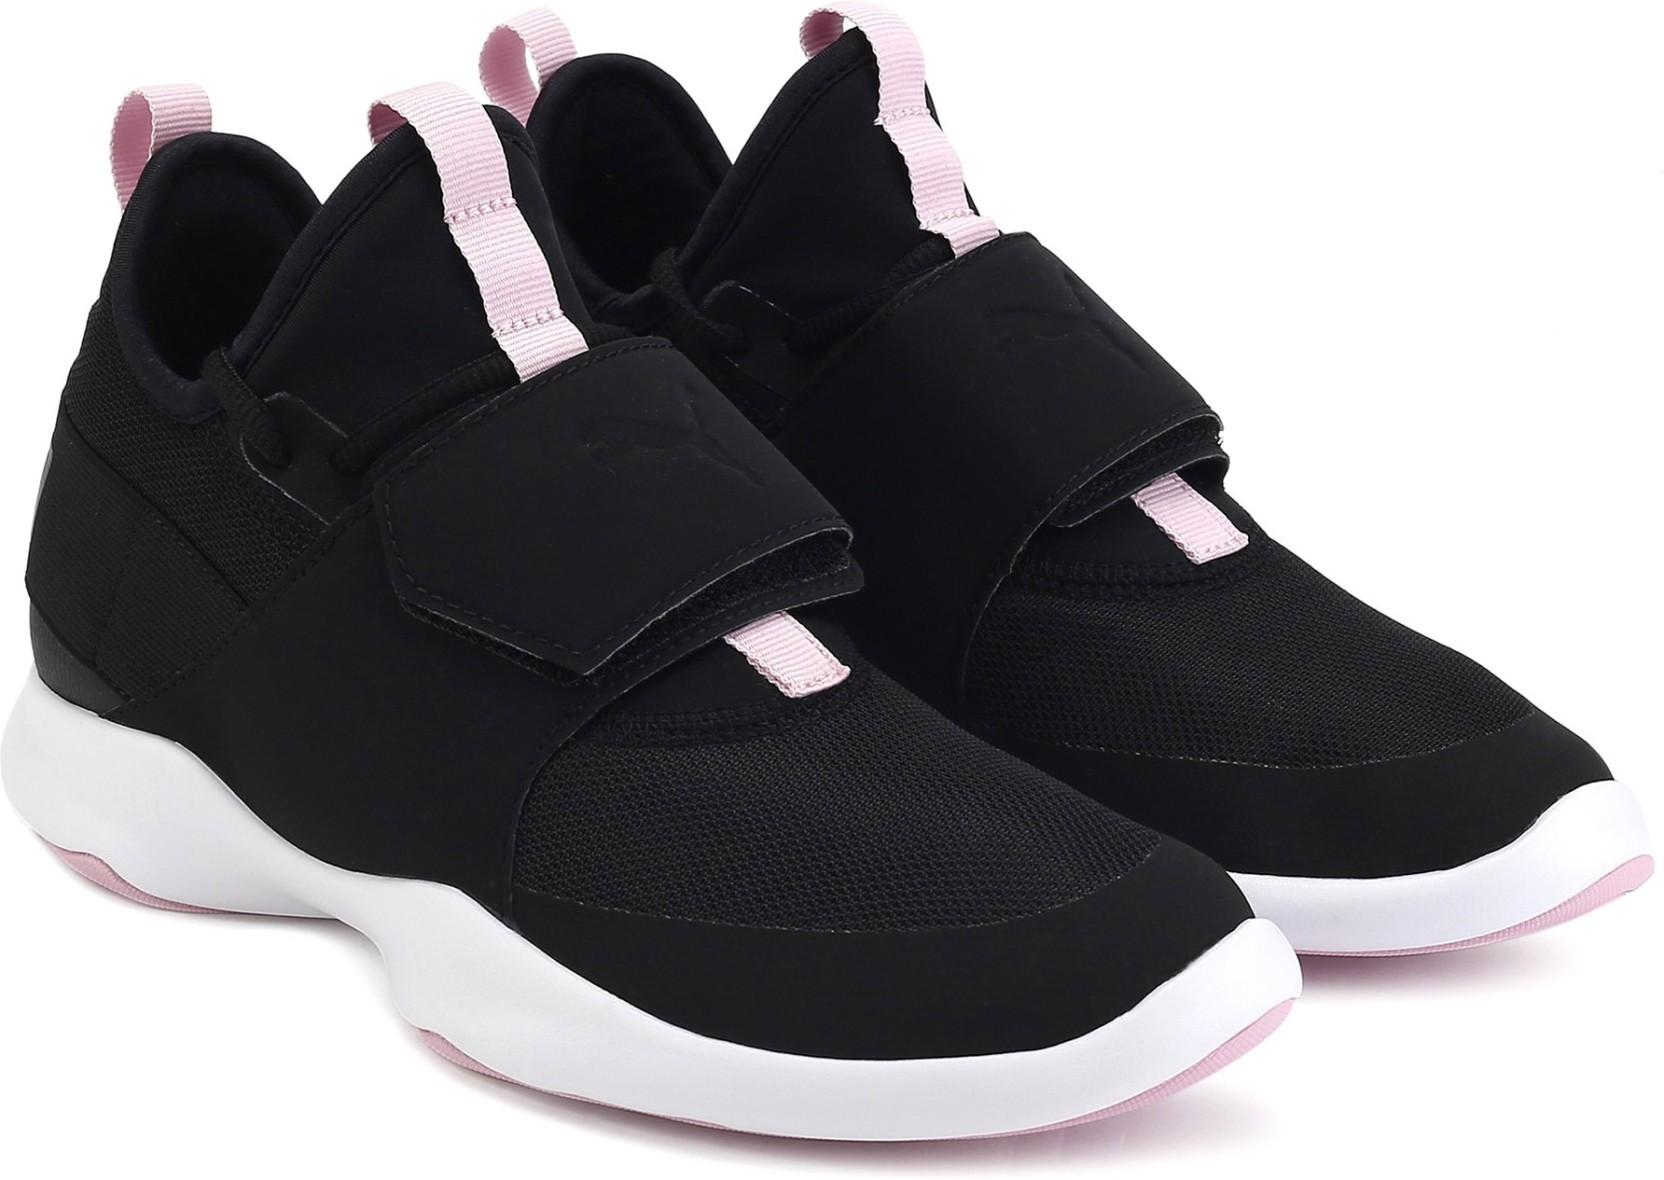 Puma Puma Dare Trainer Sneakers For Women - Buy Puma Black-Puma ... 24e77c102